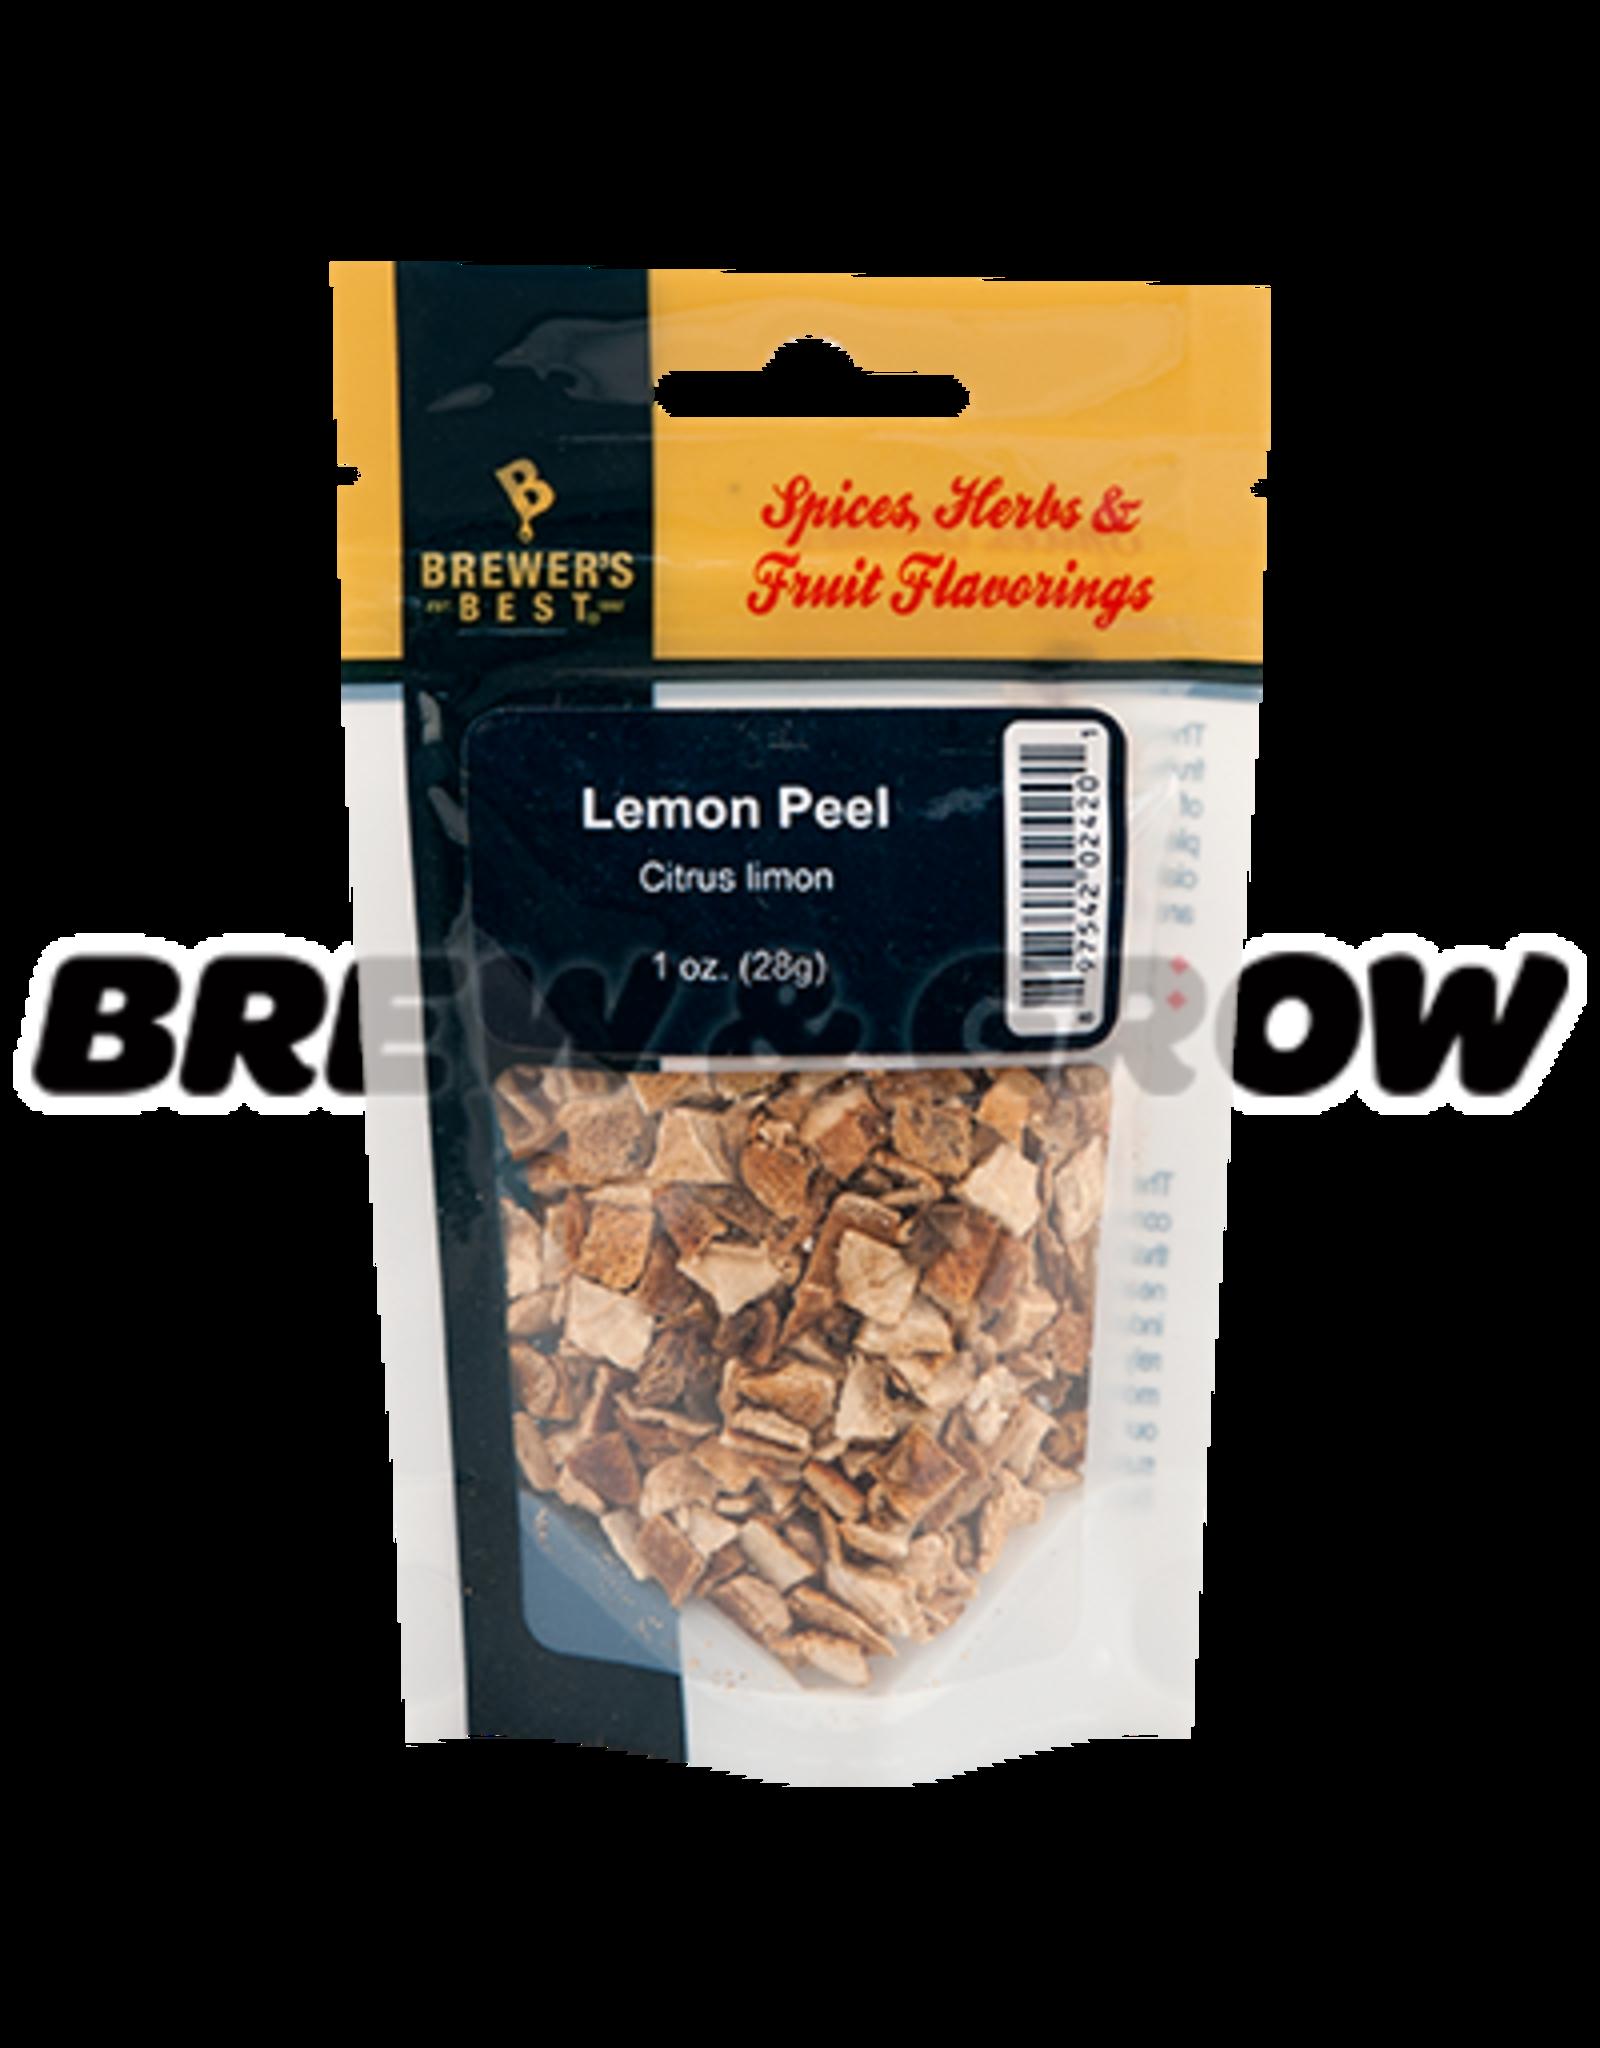 Flavoring - Lemon Peel 1 oz